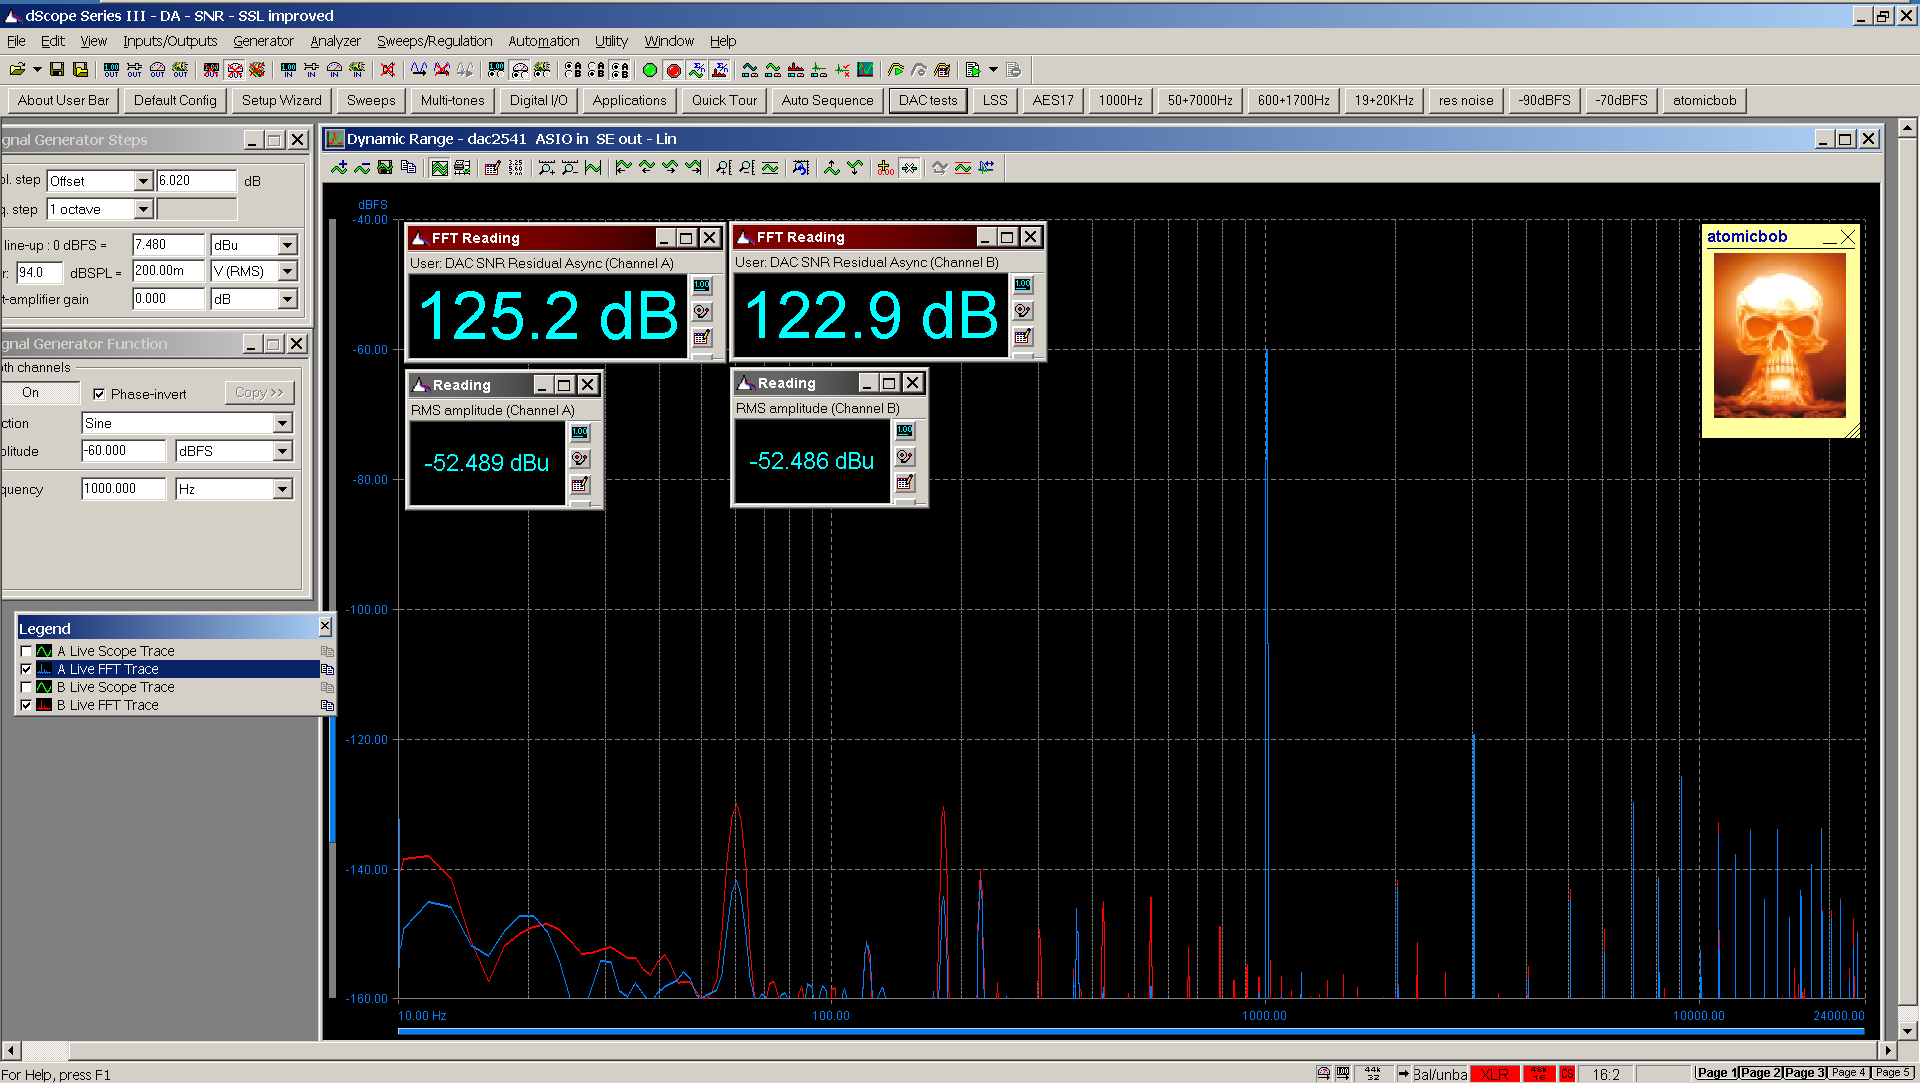 01 20210125 dac2541 dynamic range FFT USB SE.png